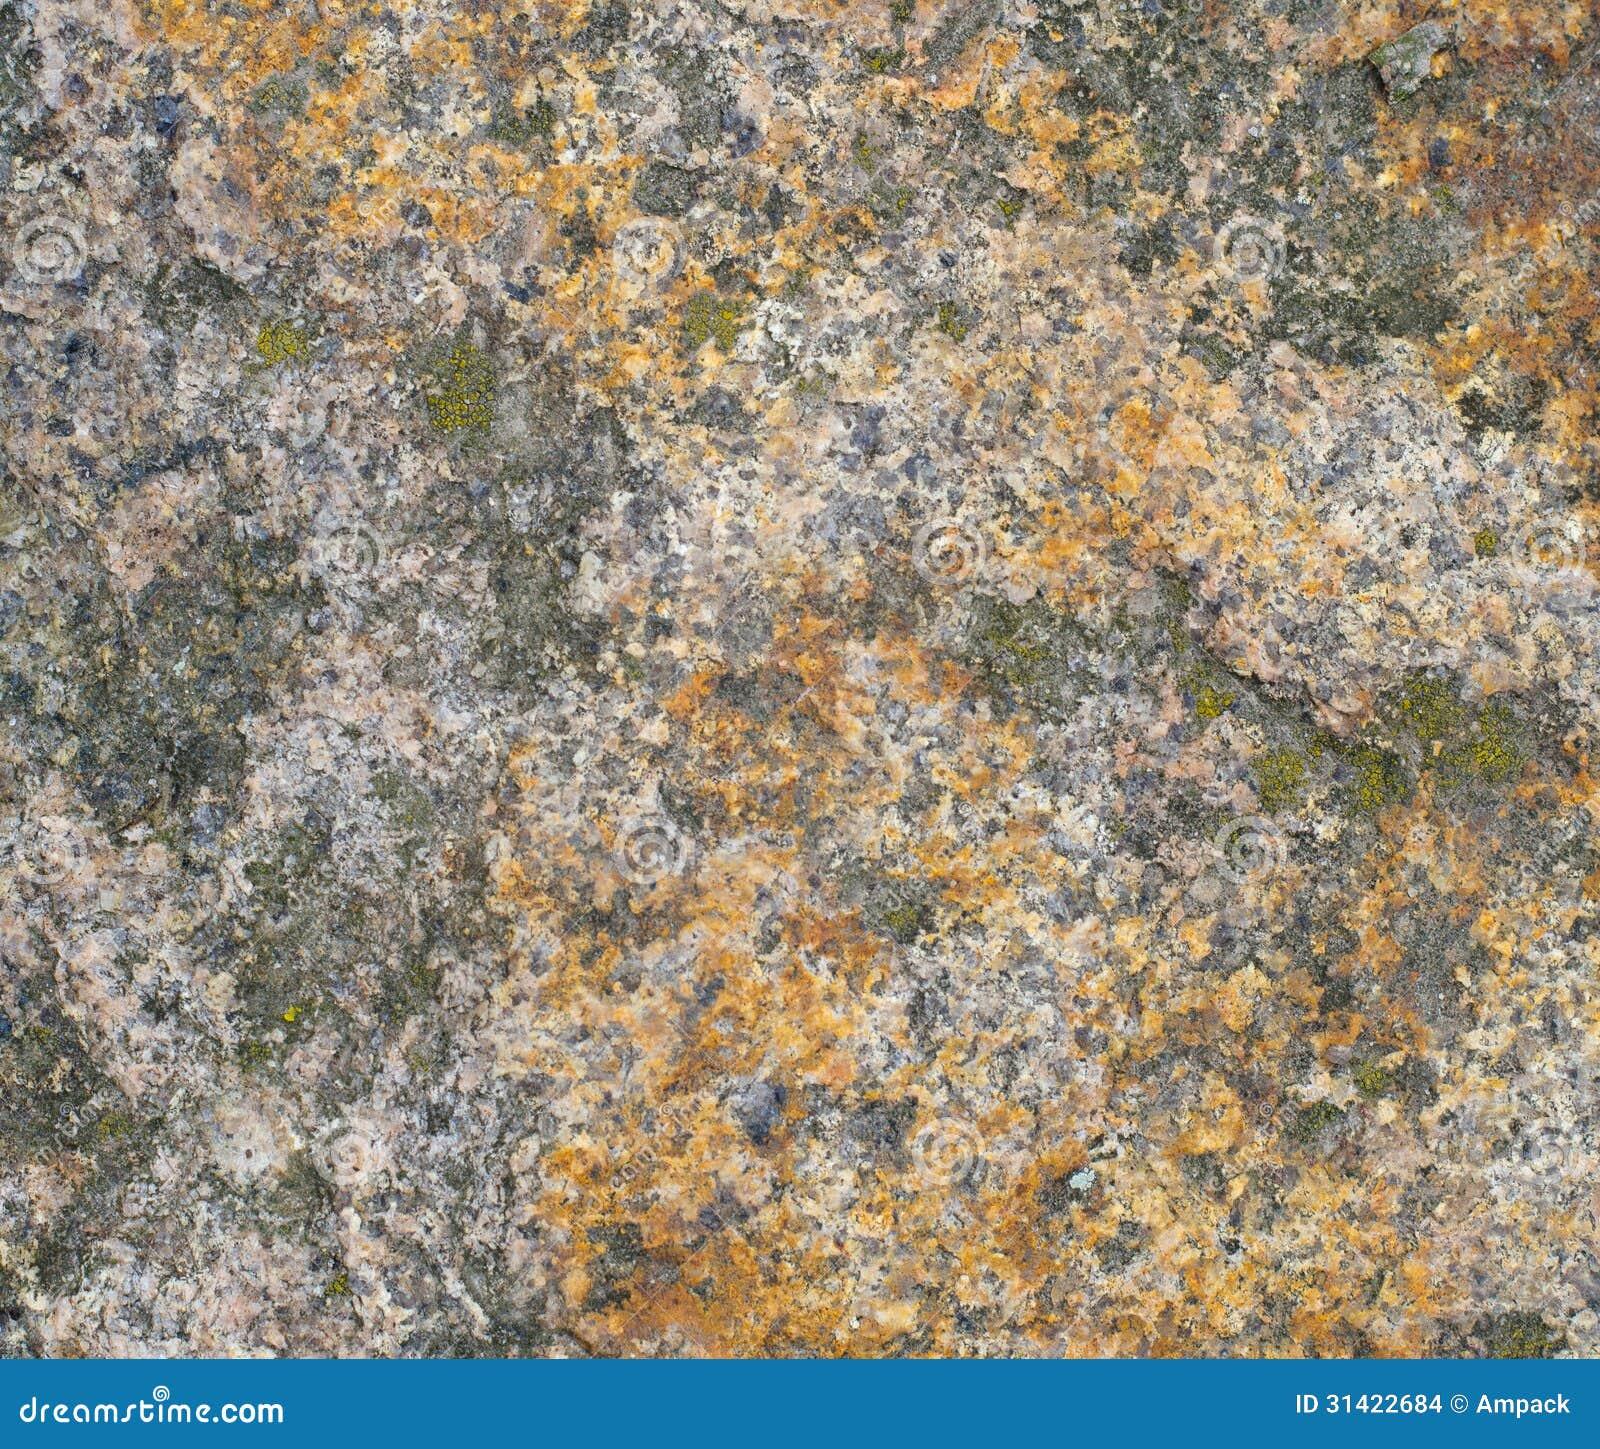 Colours Of Granite Stone : Colours Granite Stone Texture Stock Images - Image: 31422684